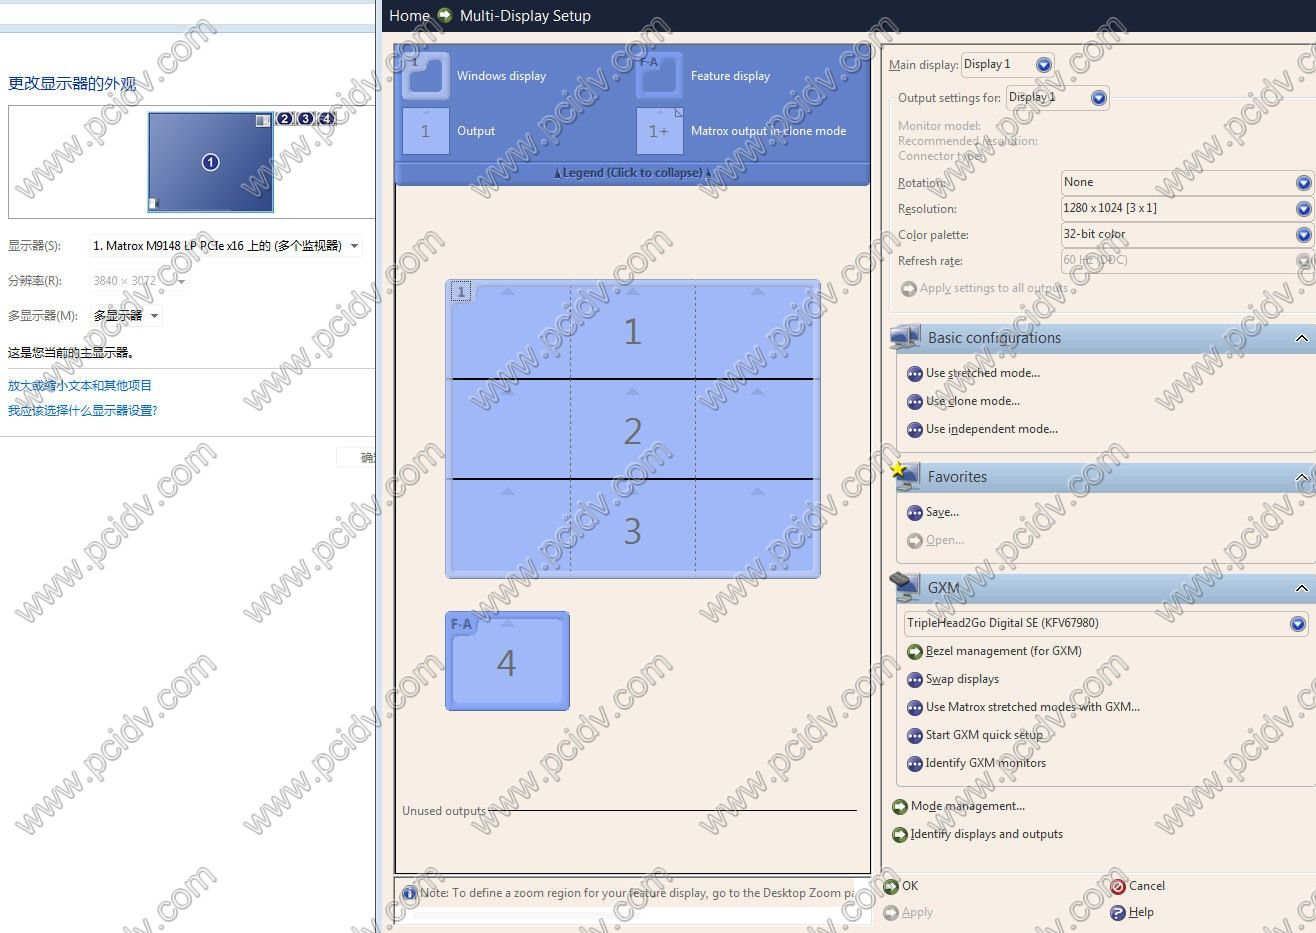 pcidv.com/迈创显卡matrox驱动说明下载